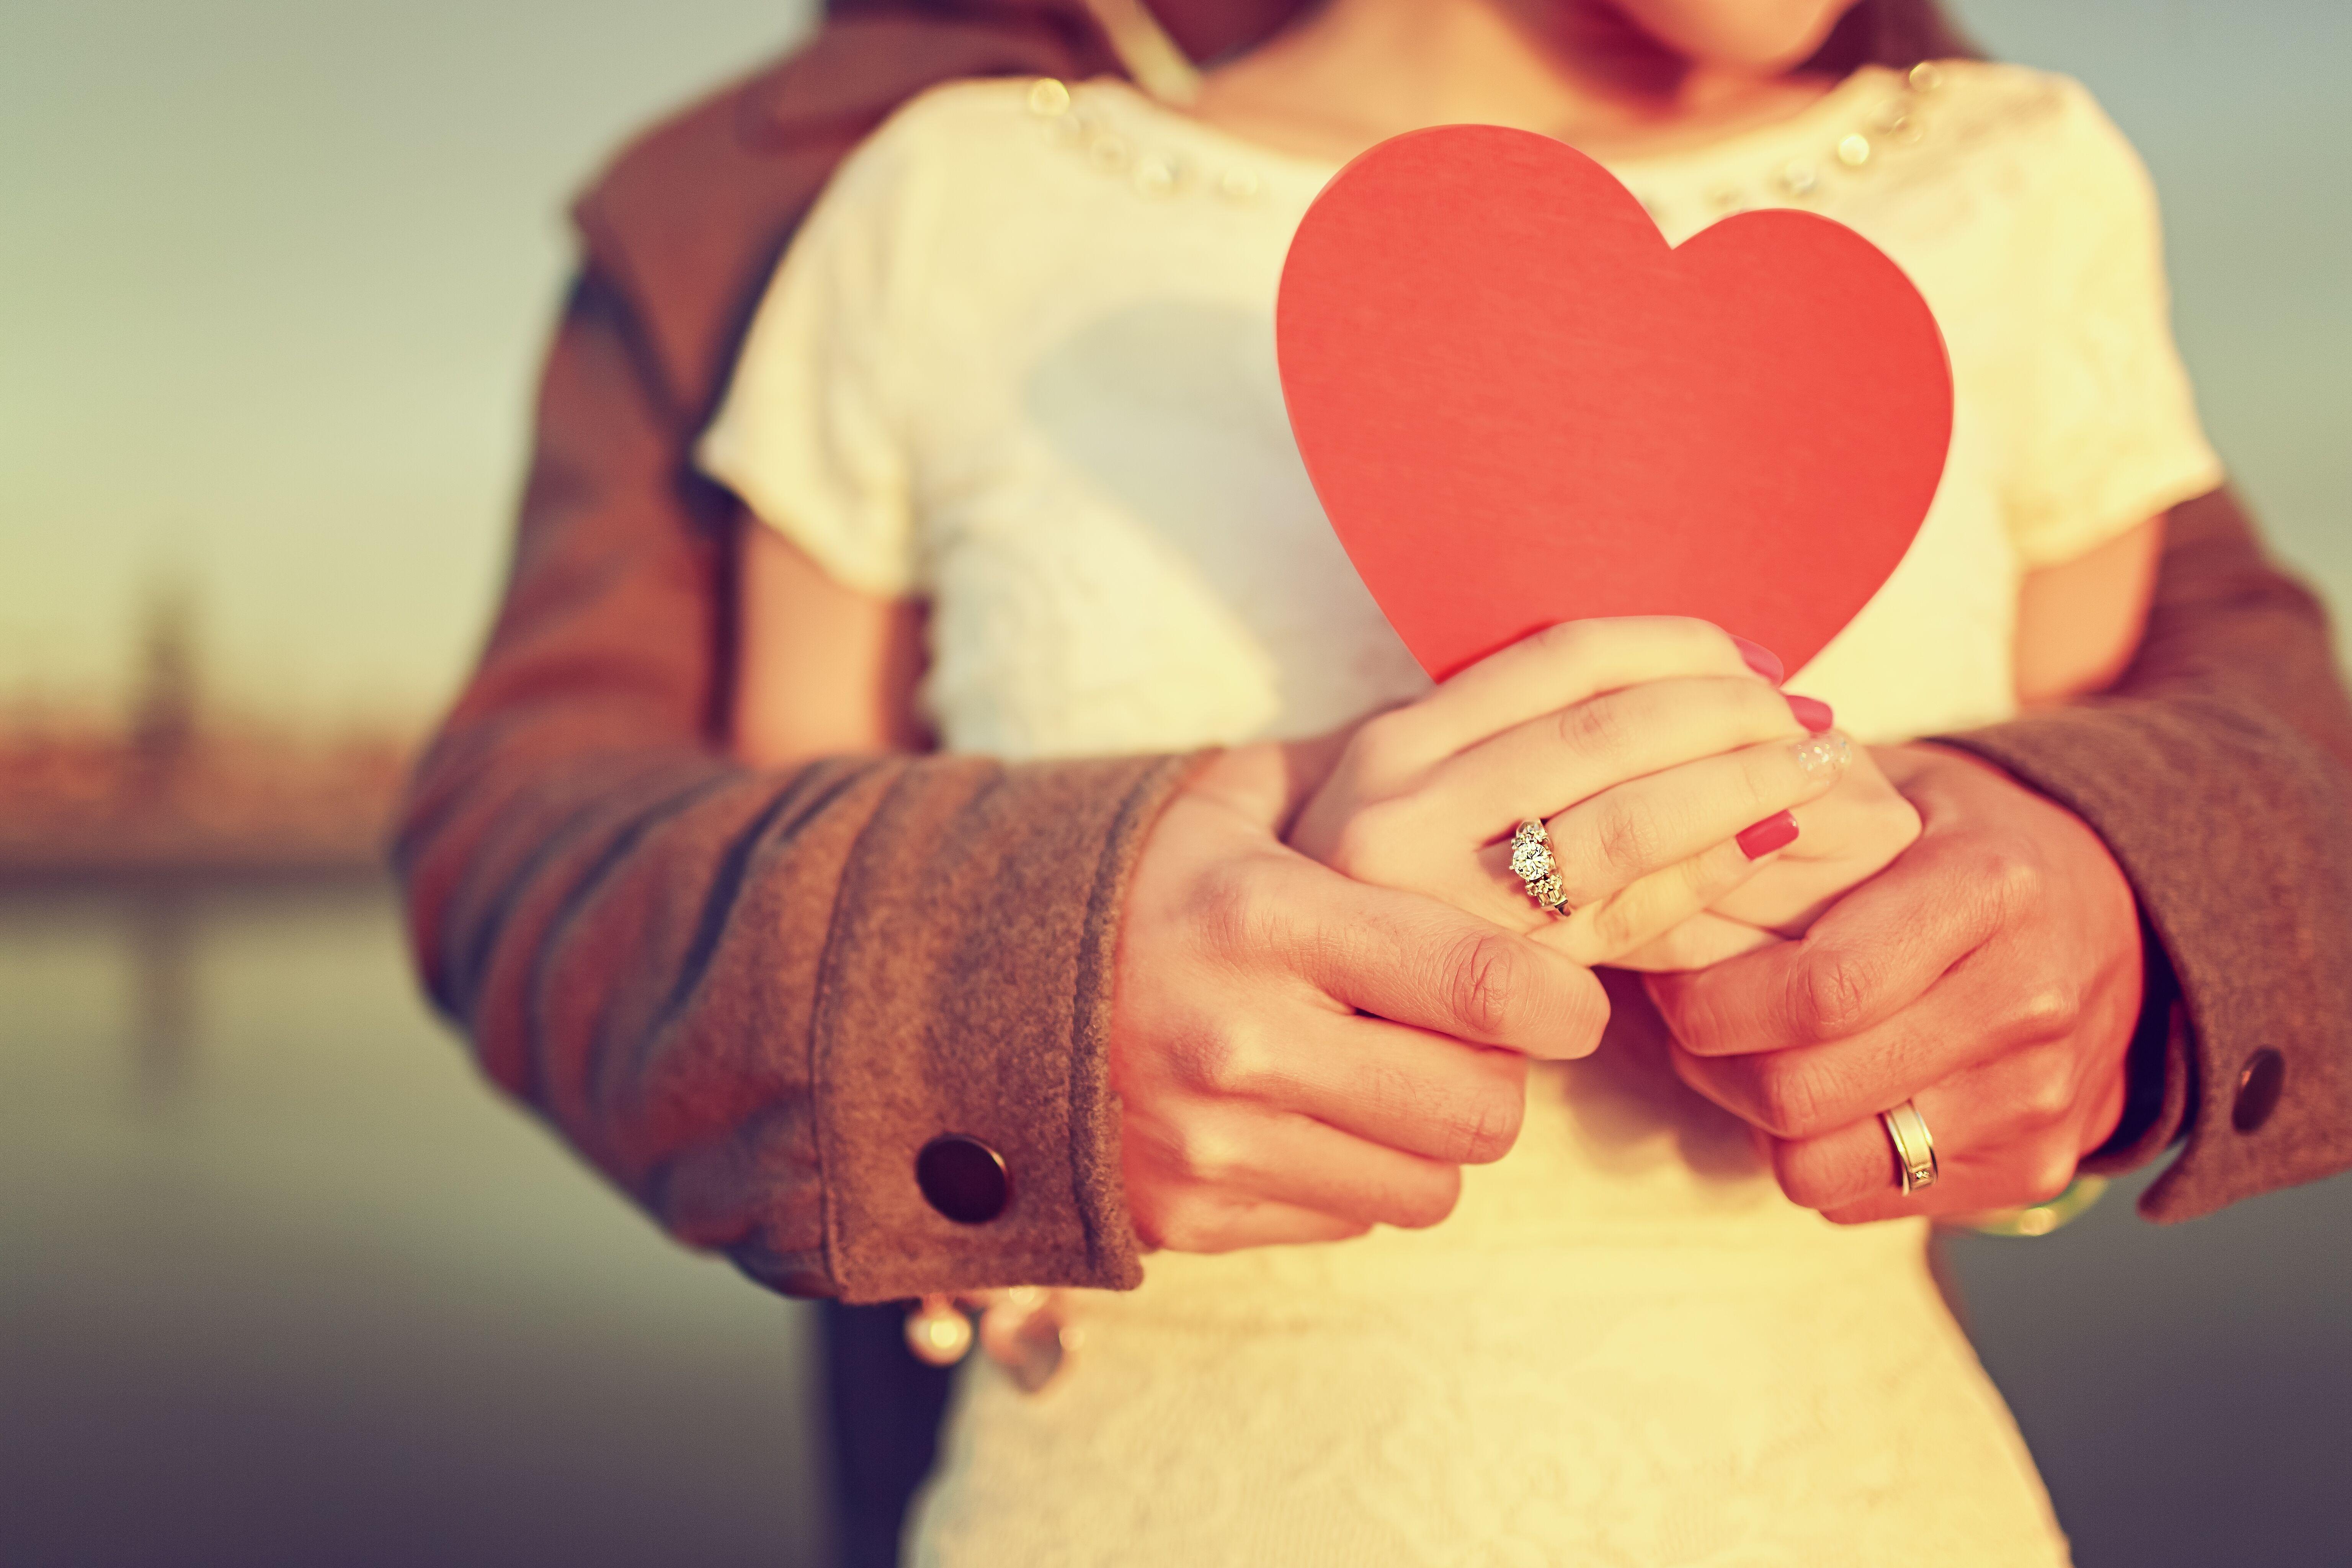 фото на аву сердечко в руках одно преимущество